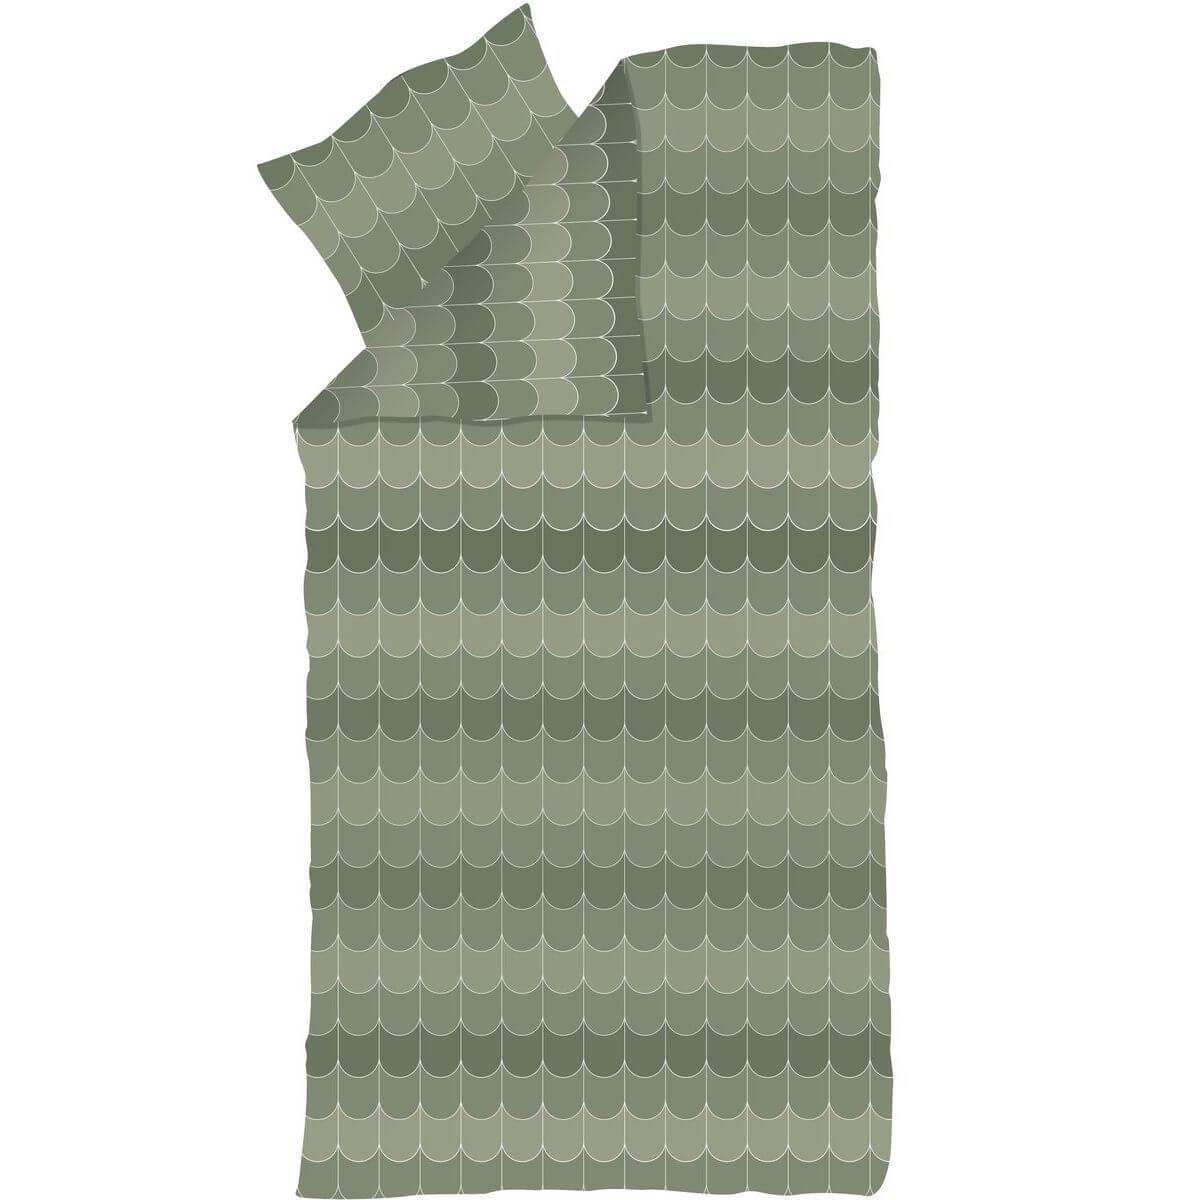 Funda nórdica 140x200cm-almohada 60x63cm POPSICLE Flexa kiwi